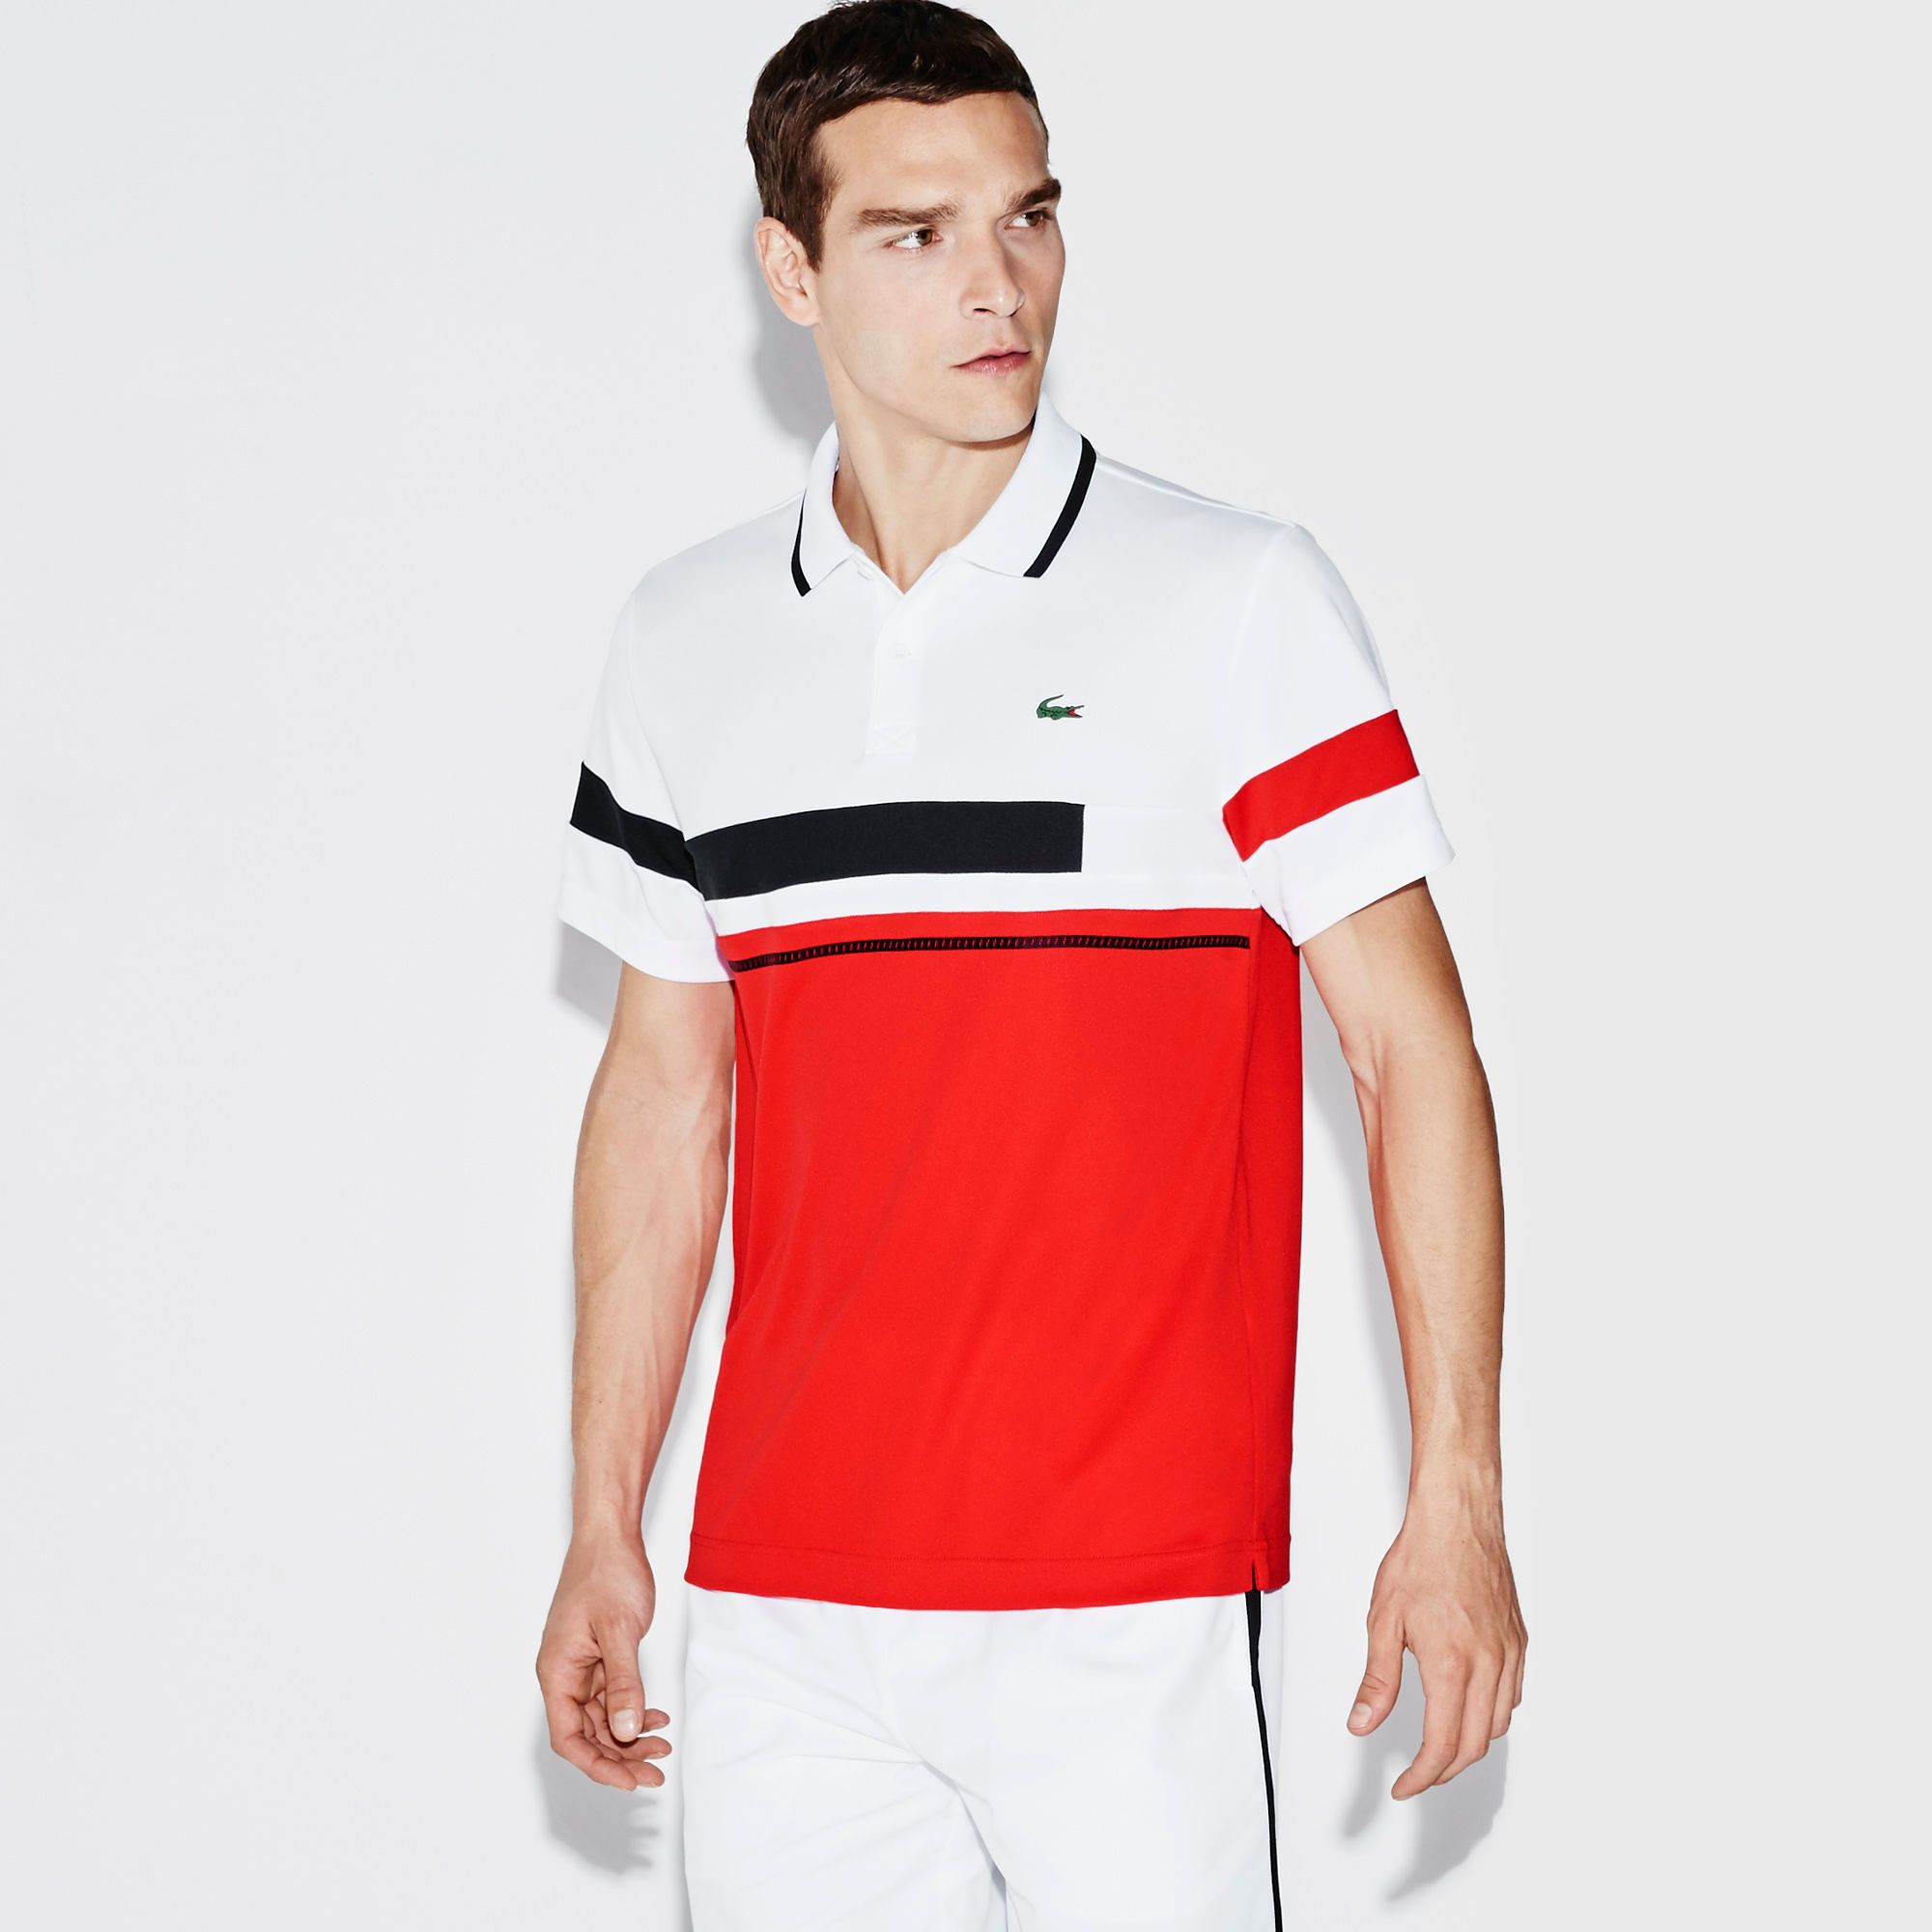 Men S Sport Ultra Dry Color Block Tennis Polo Lacoste Polo Shirt Design Mens Polo Shirts Casual Shirts For Men